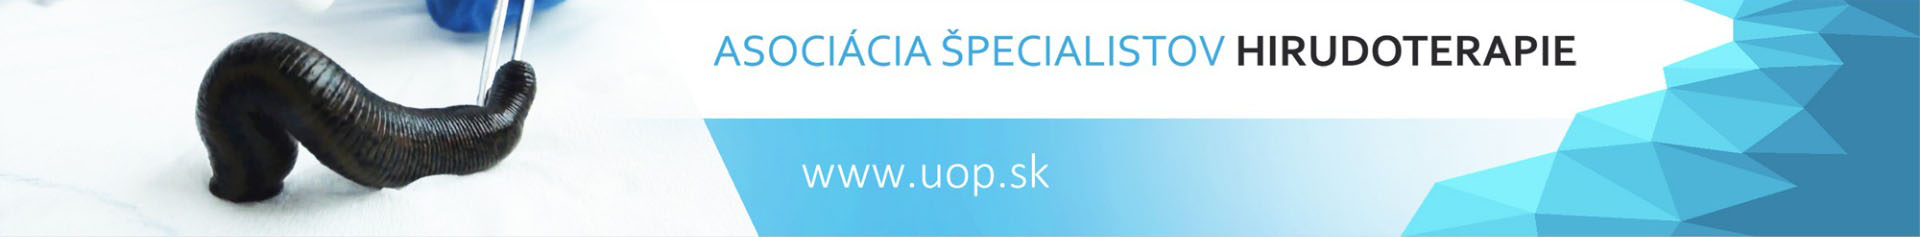 Asociácia špecialistov hirudoterapie